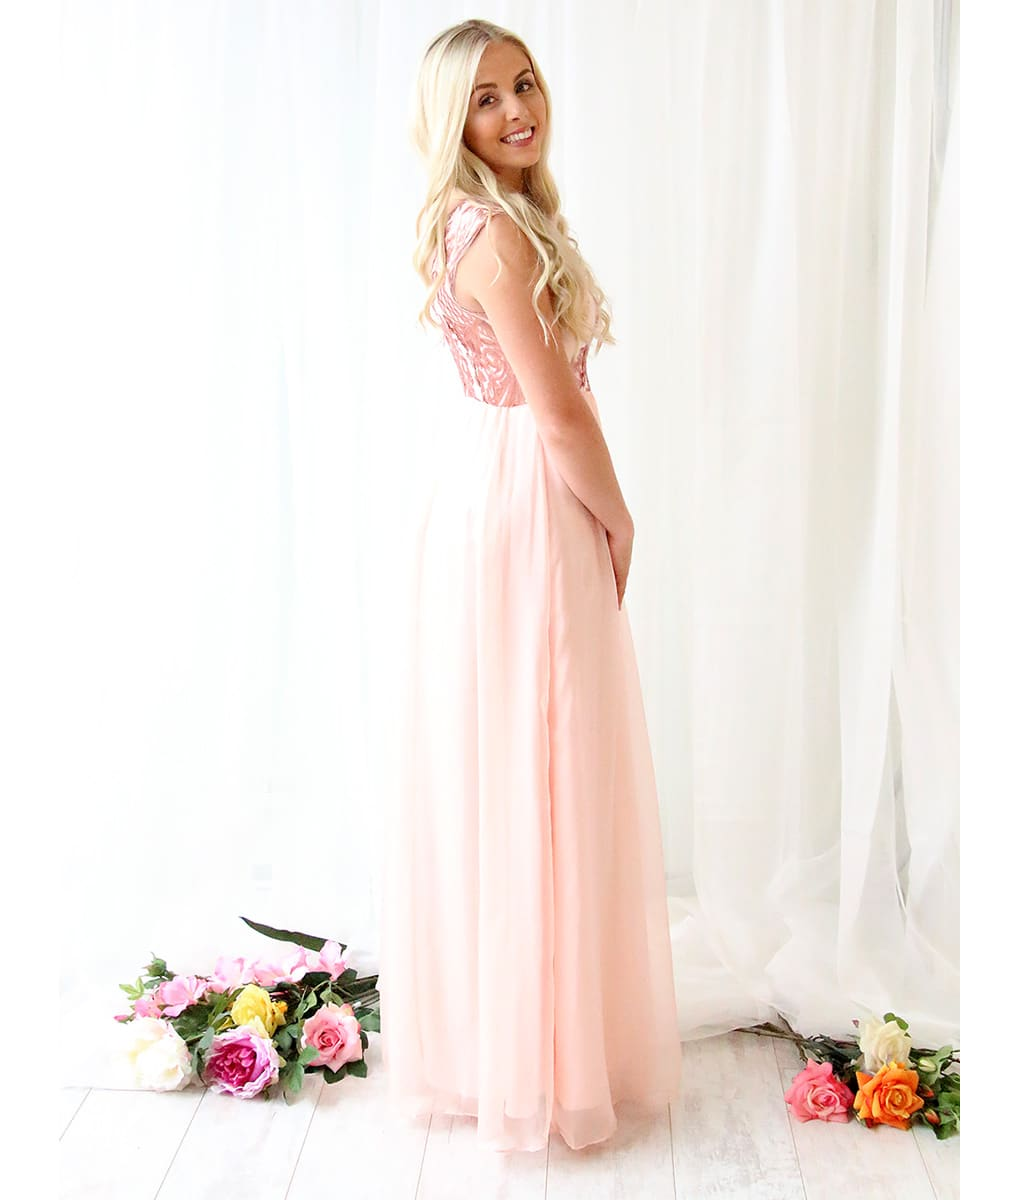 Alila-Blush-Chiffon-evening-gown-Bariano